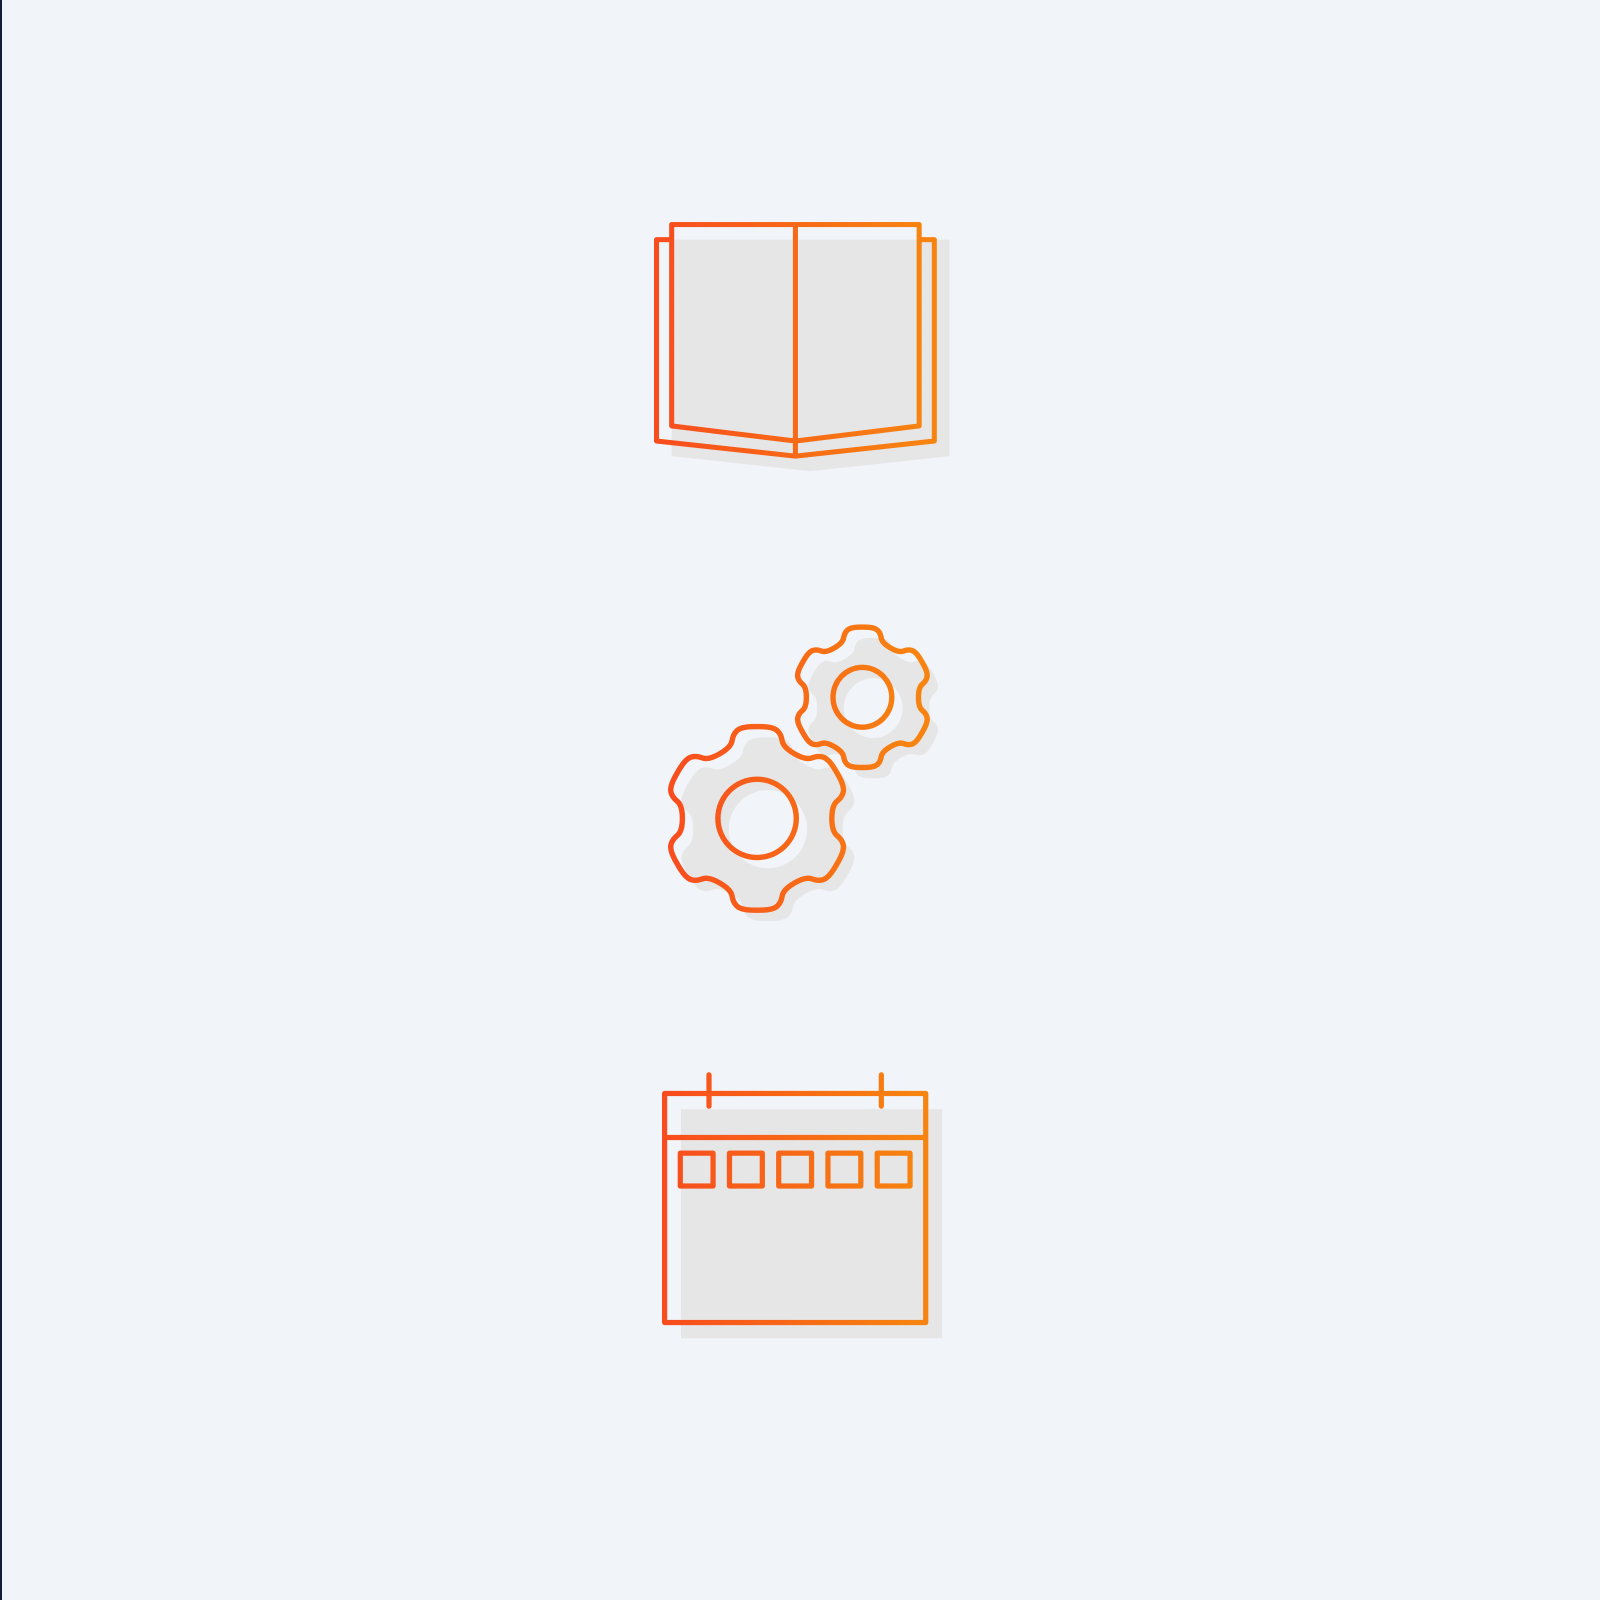 UVA Launchpad icons